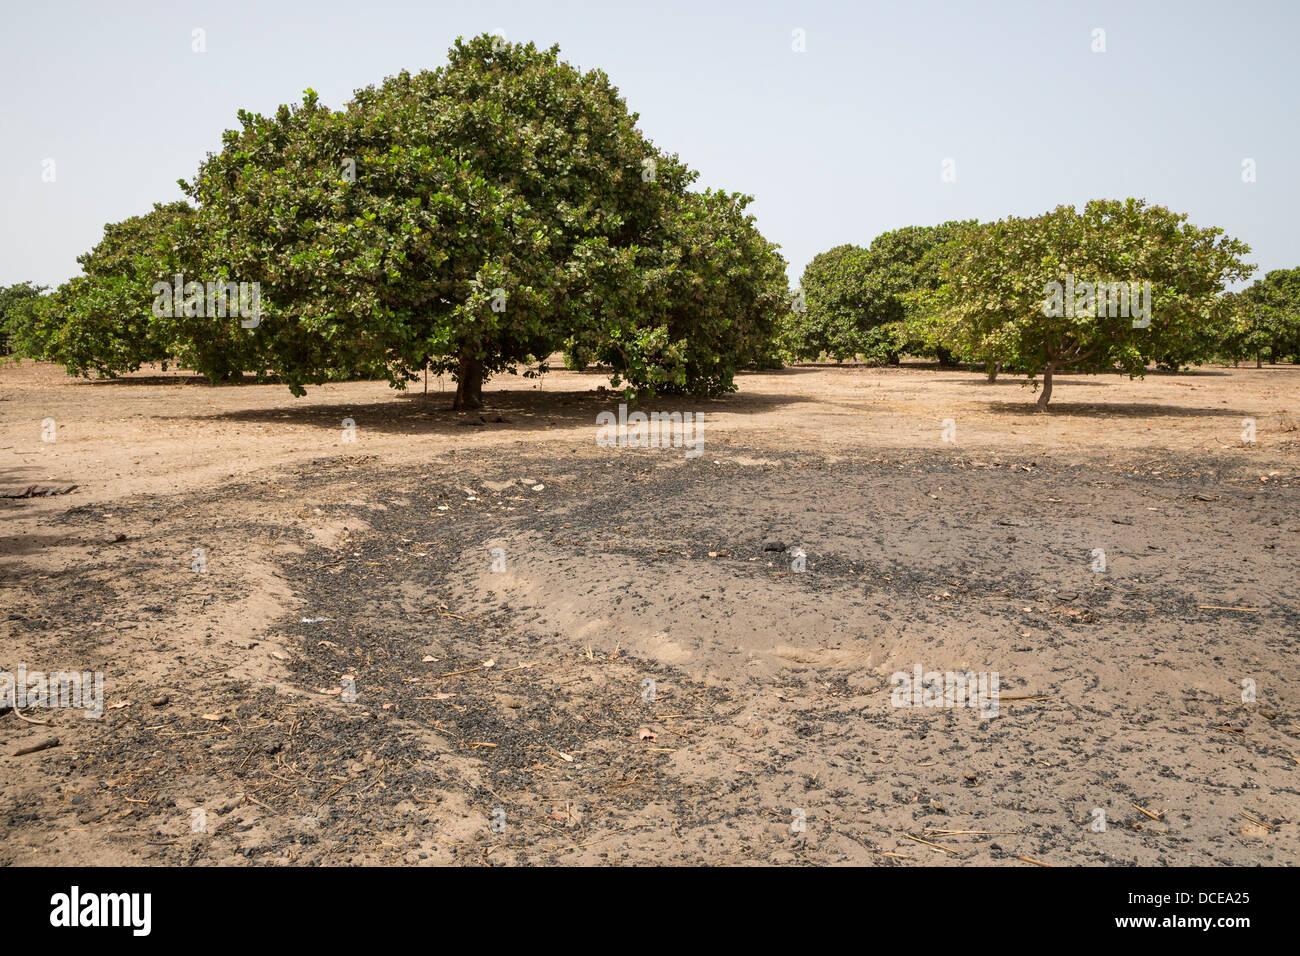 Cashew Nut Trees, near Sokone, Senegal. - Stock Image